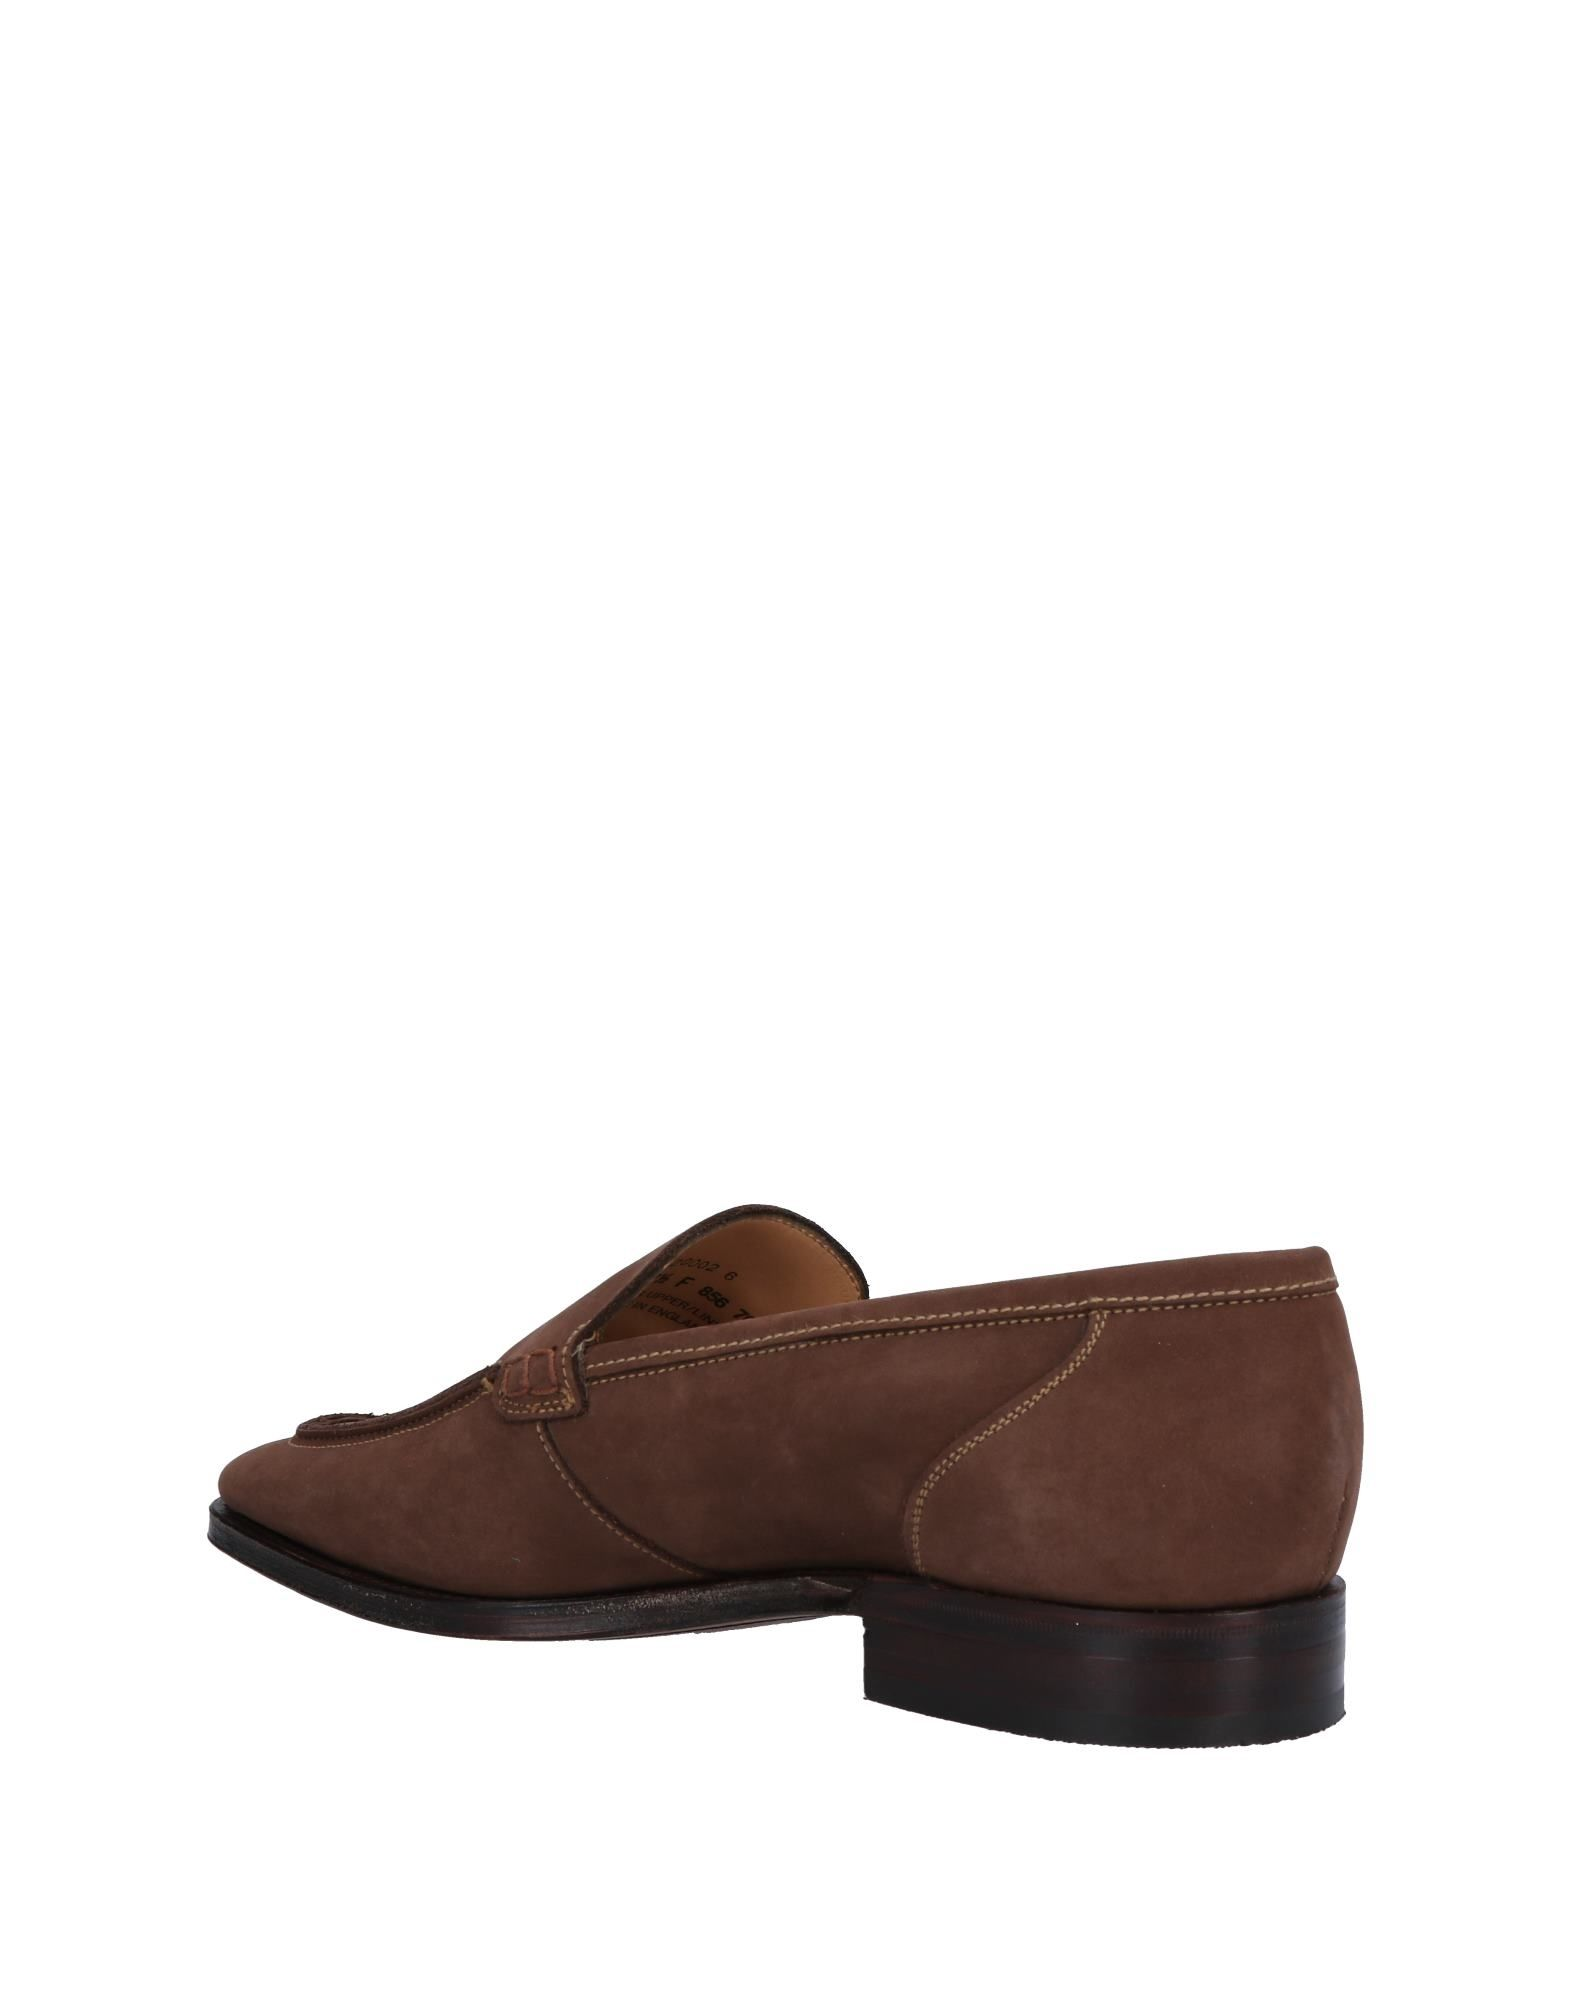 Alfred Herren Sargent Mokassins Herren Alfred  11487639QT Neue Schuhe be48d4